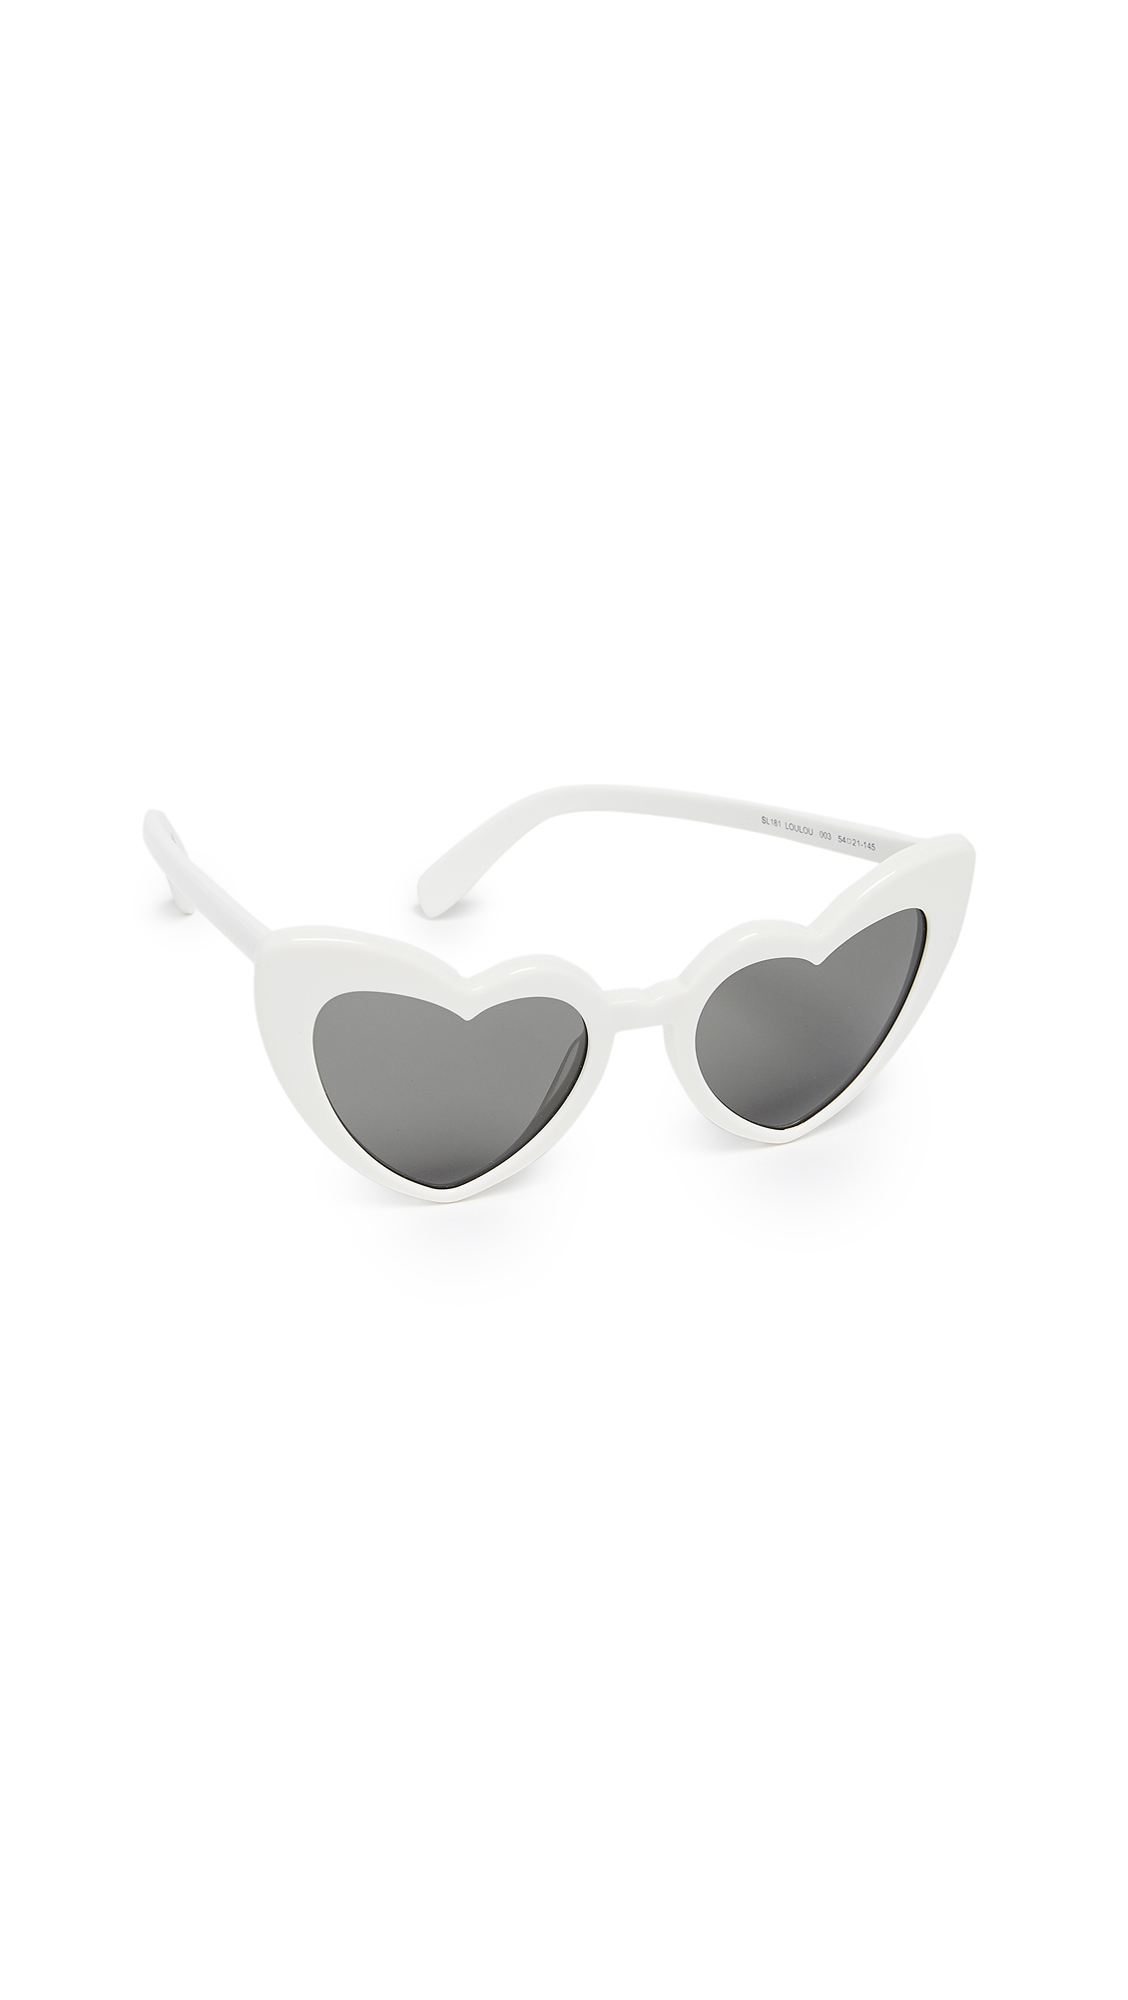 Saint Laurent SL 181 Lou Lou Hearts Sunglasses In Ivory